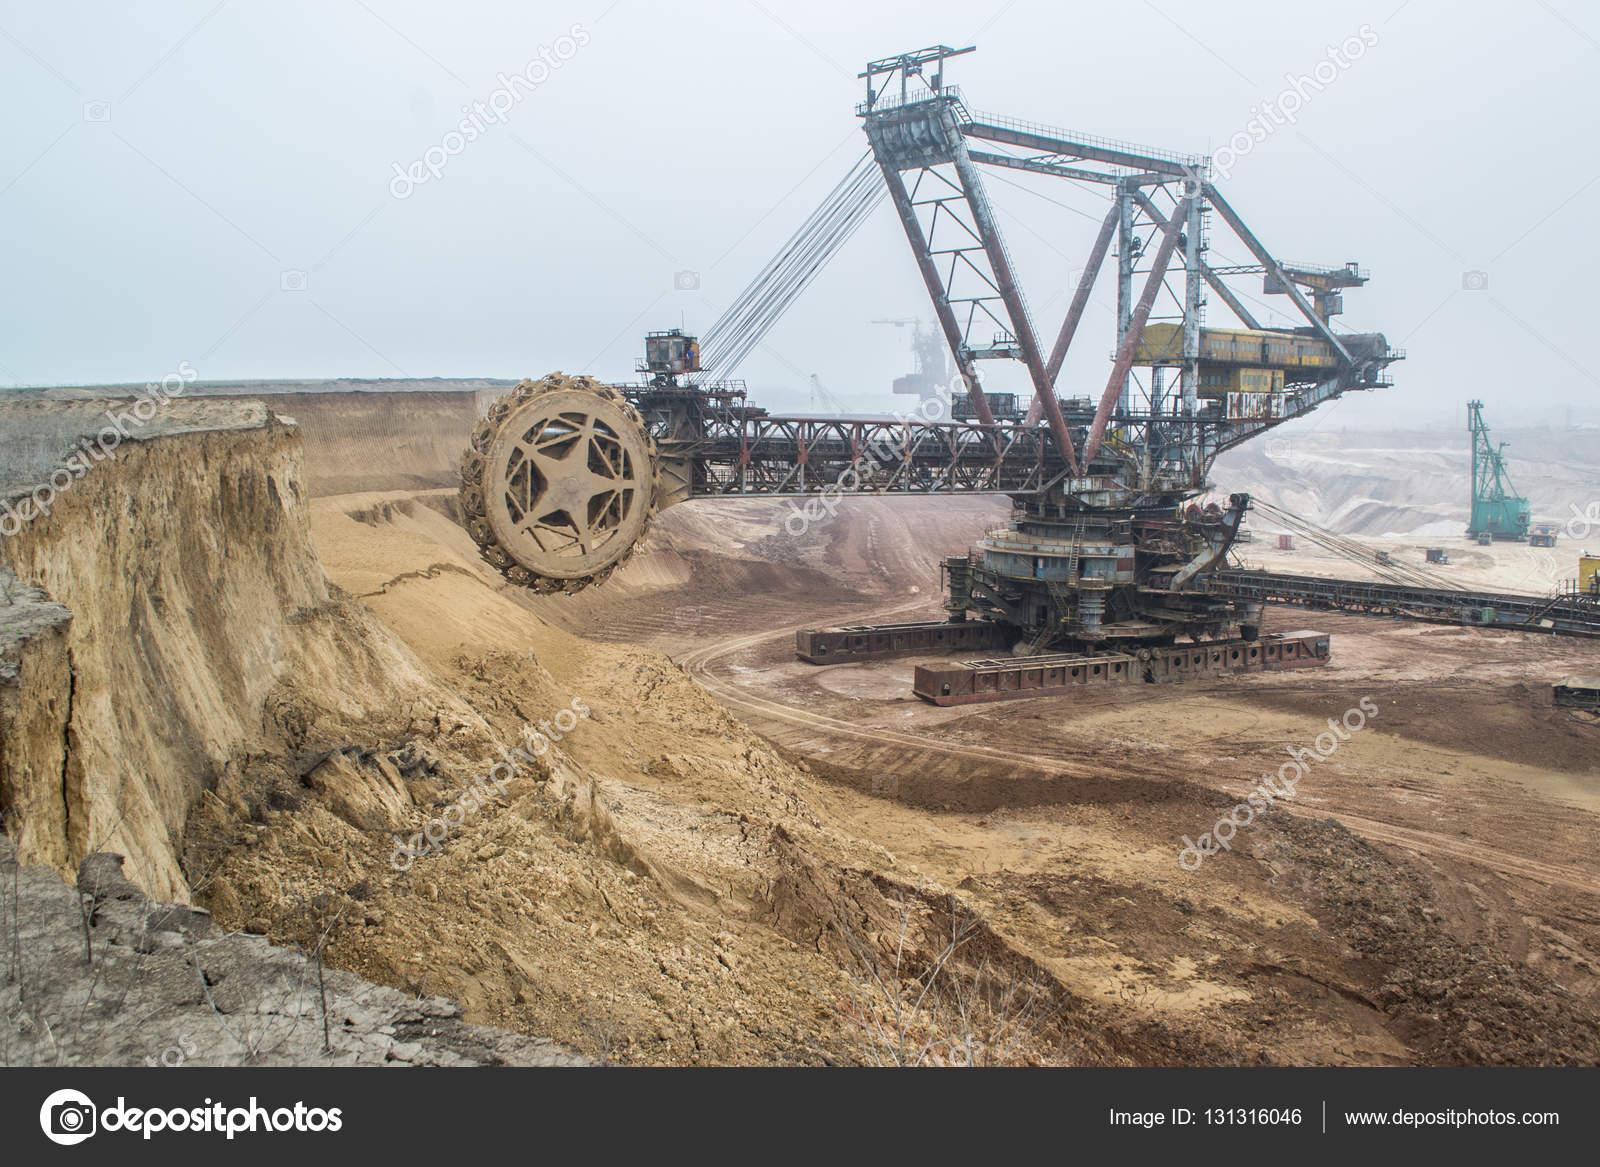 Biggest Excavator In The World Working Bagger 228 Ukraine Big Mine Develop Mineral Resources Excavator Digs Metallurgy In Ukraine Stock Photo C Mysokol 131316046